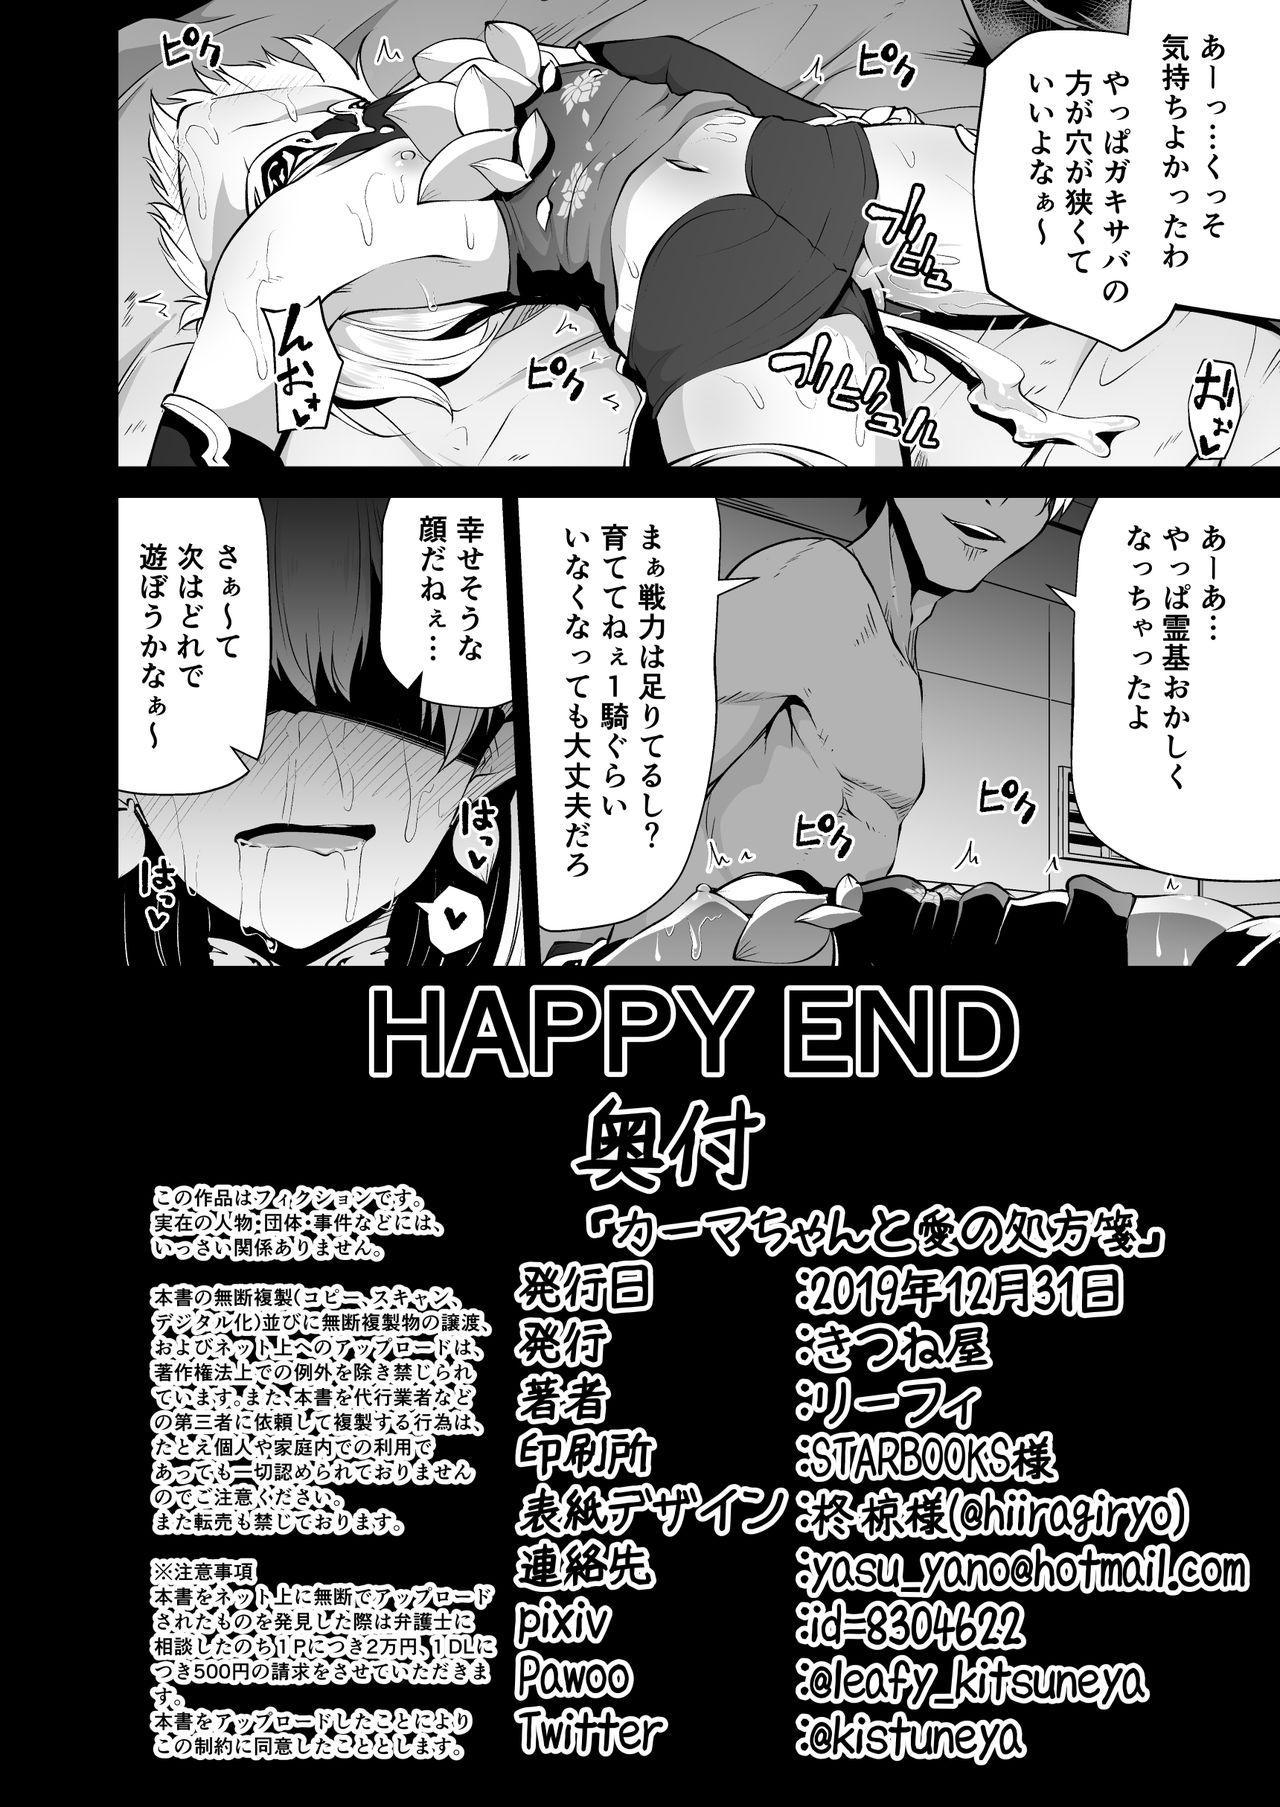 [Kitsuneya (Leafy)] Kama-chan to Love-prescription (Fate/Grand Order) [Digital] 25